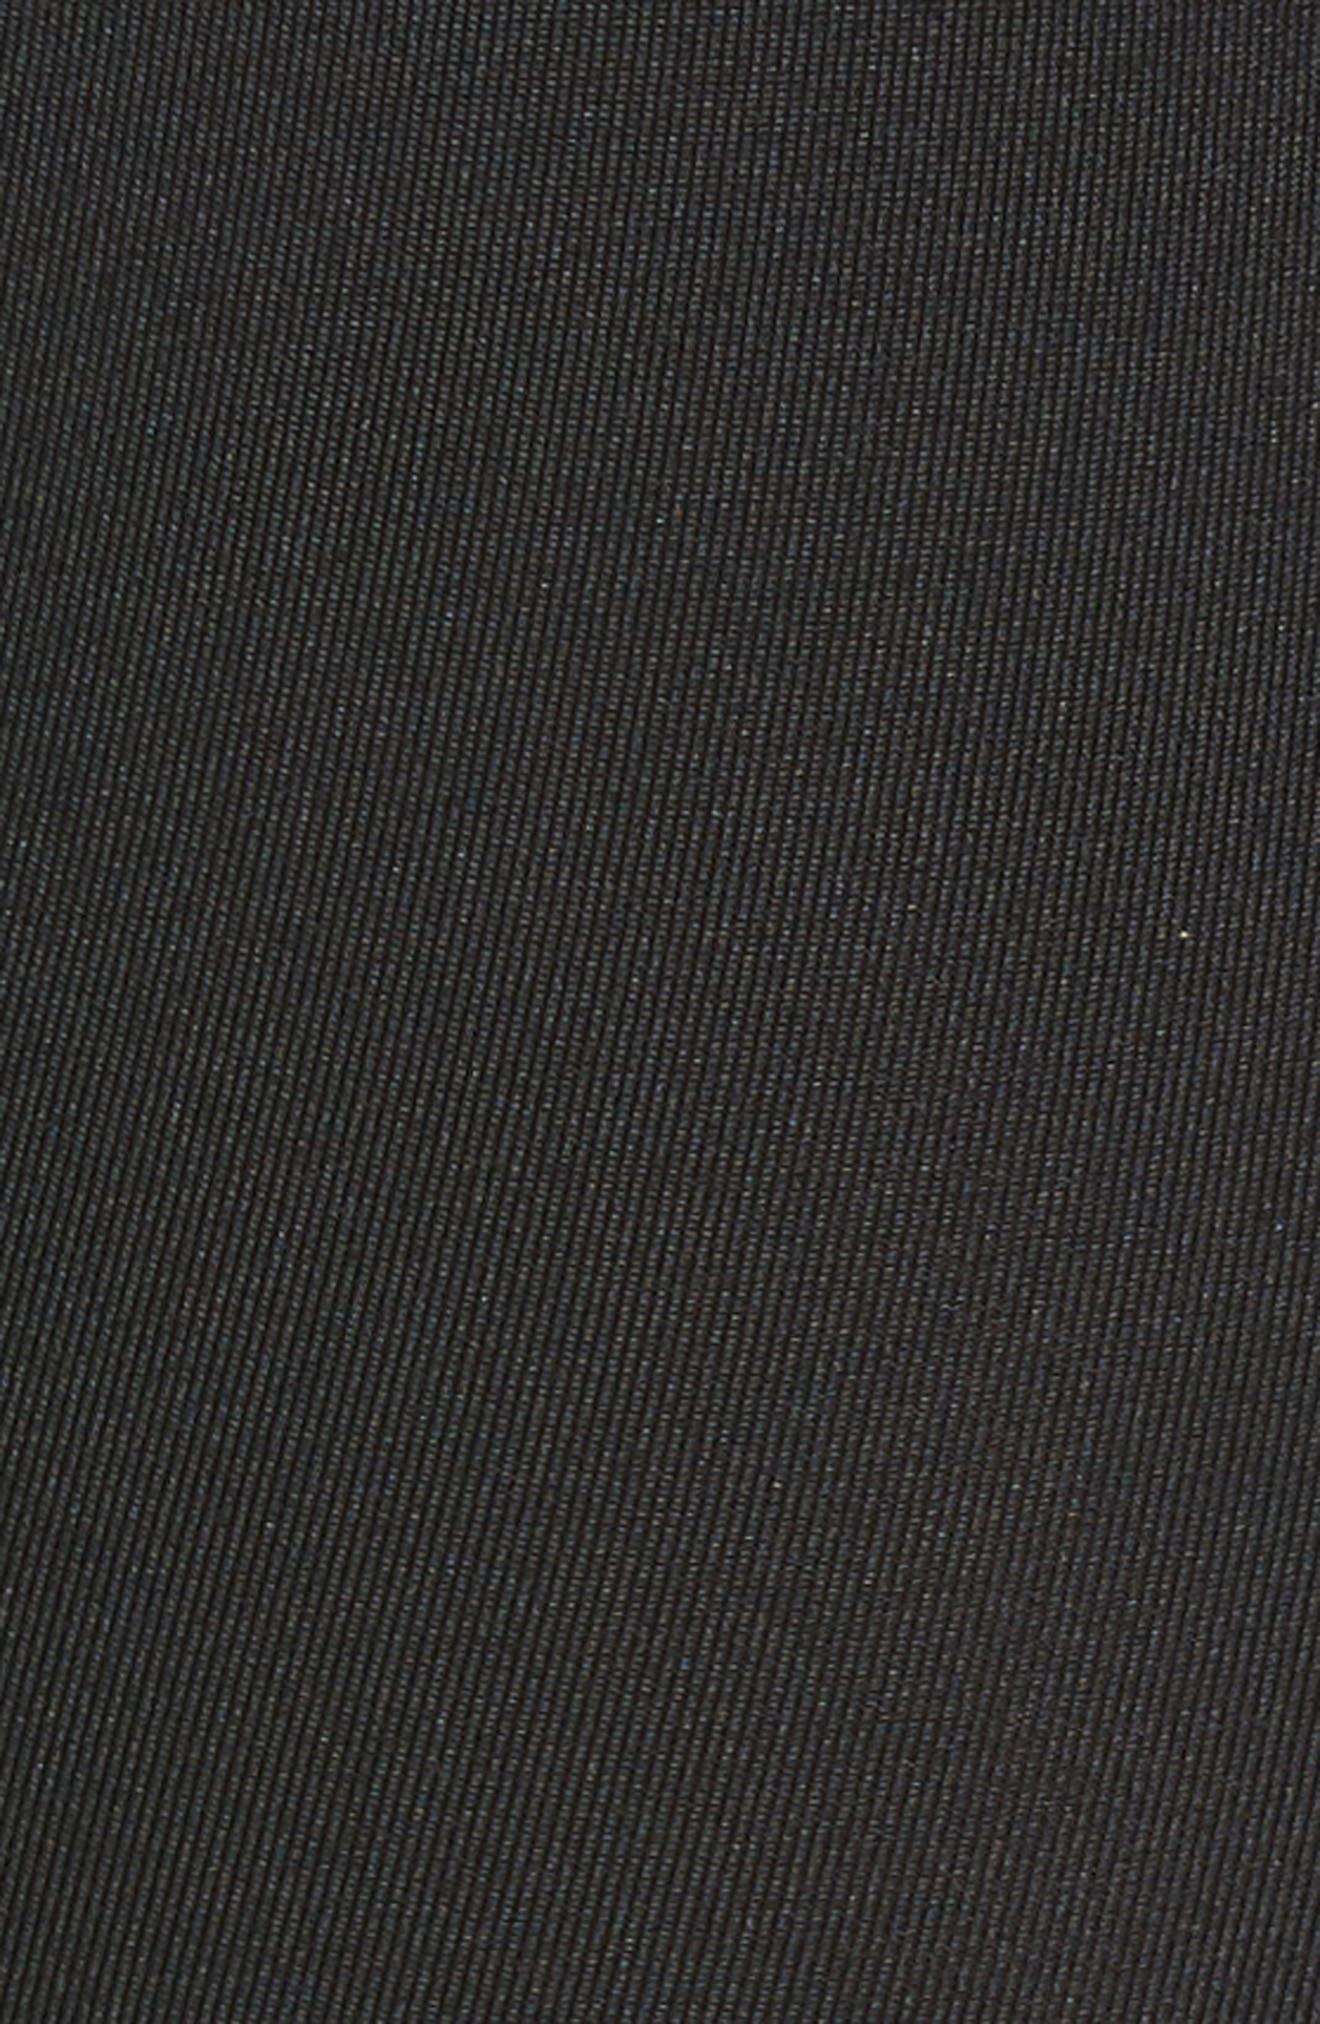 Sport Compression Shorts,                             Alternate thumbnail 5, color,                             001